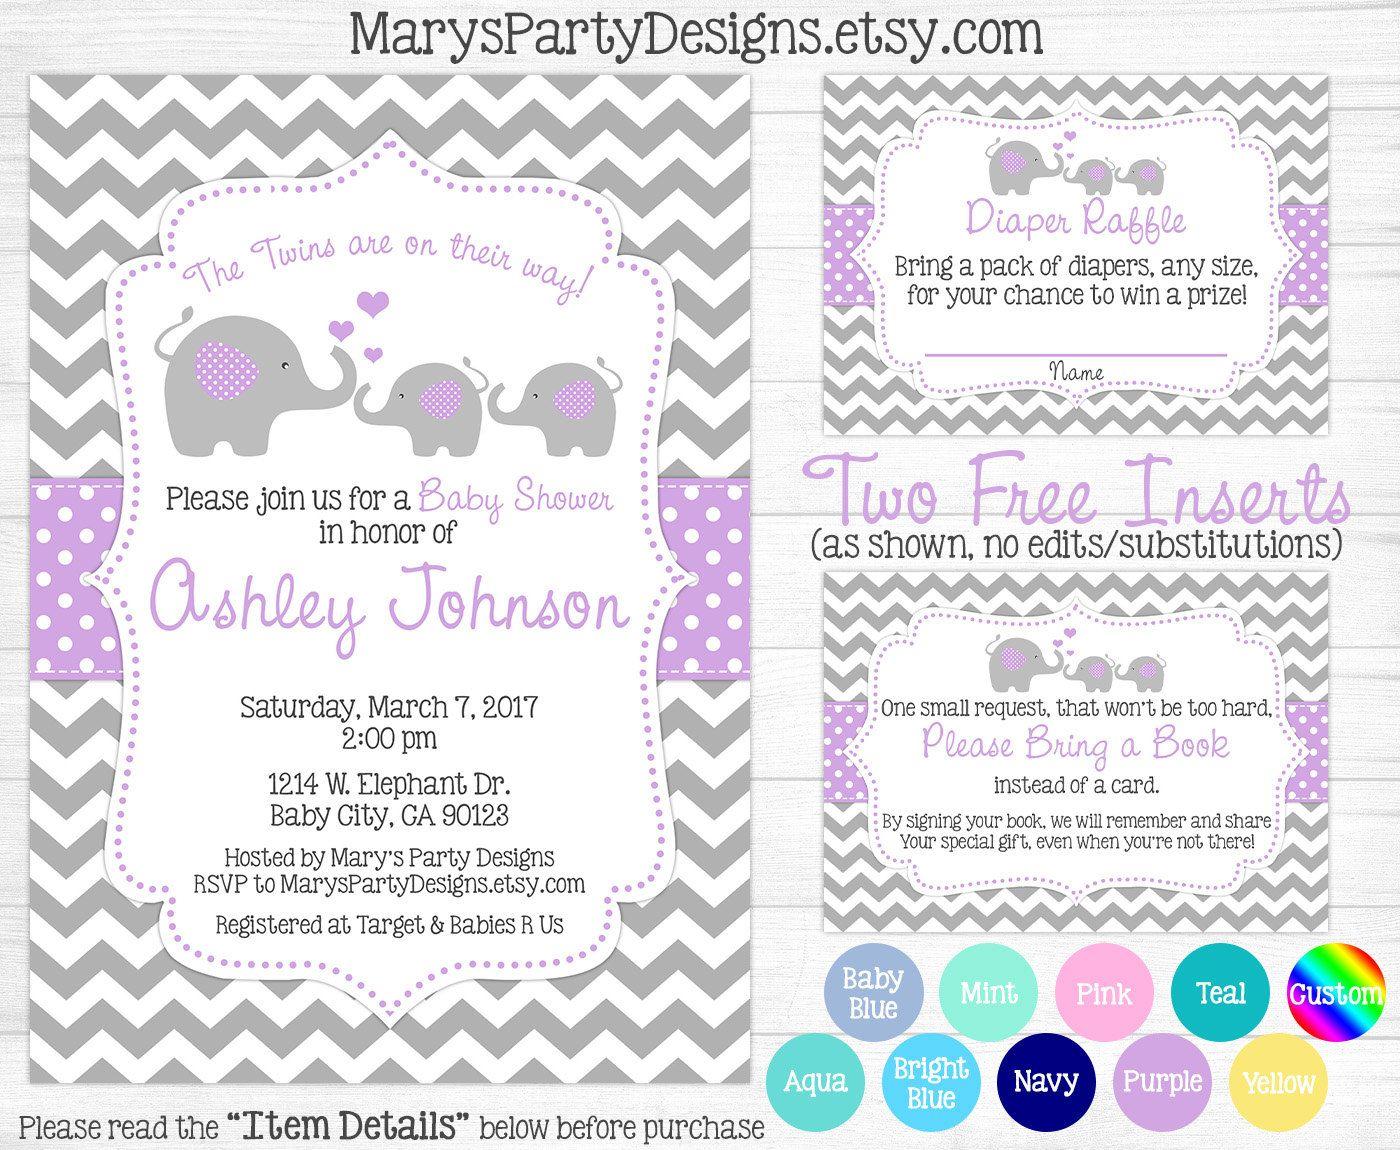 Elephant Twins Baby Shower Invitation - Aqua Blue Mint Teal Boy Girl ...